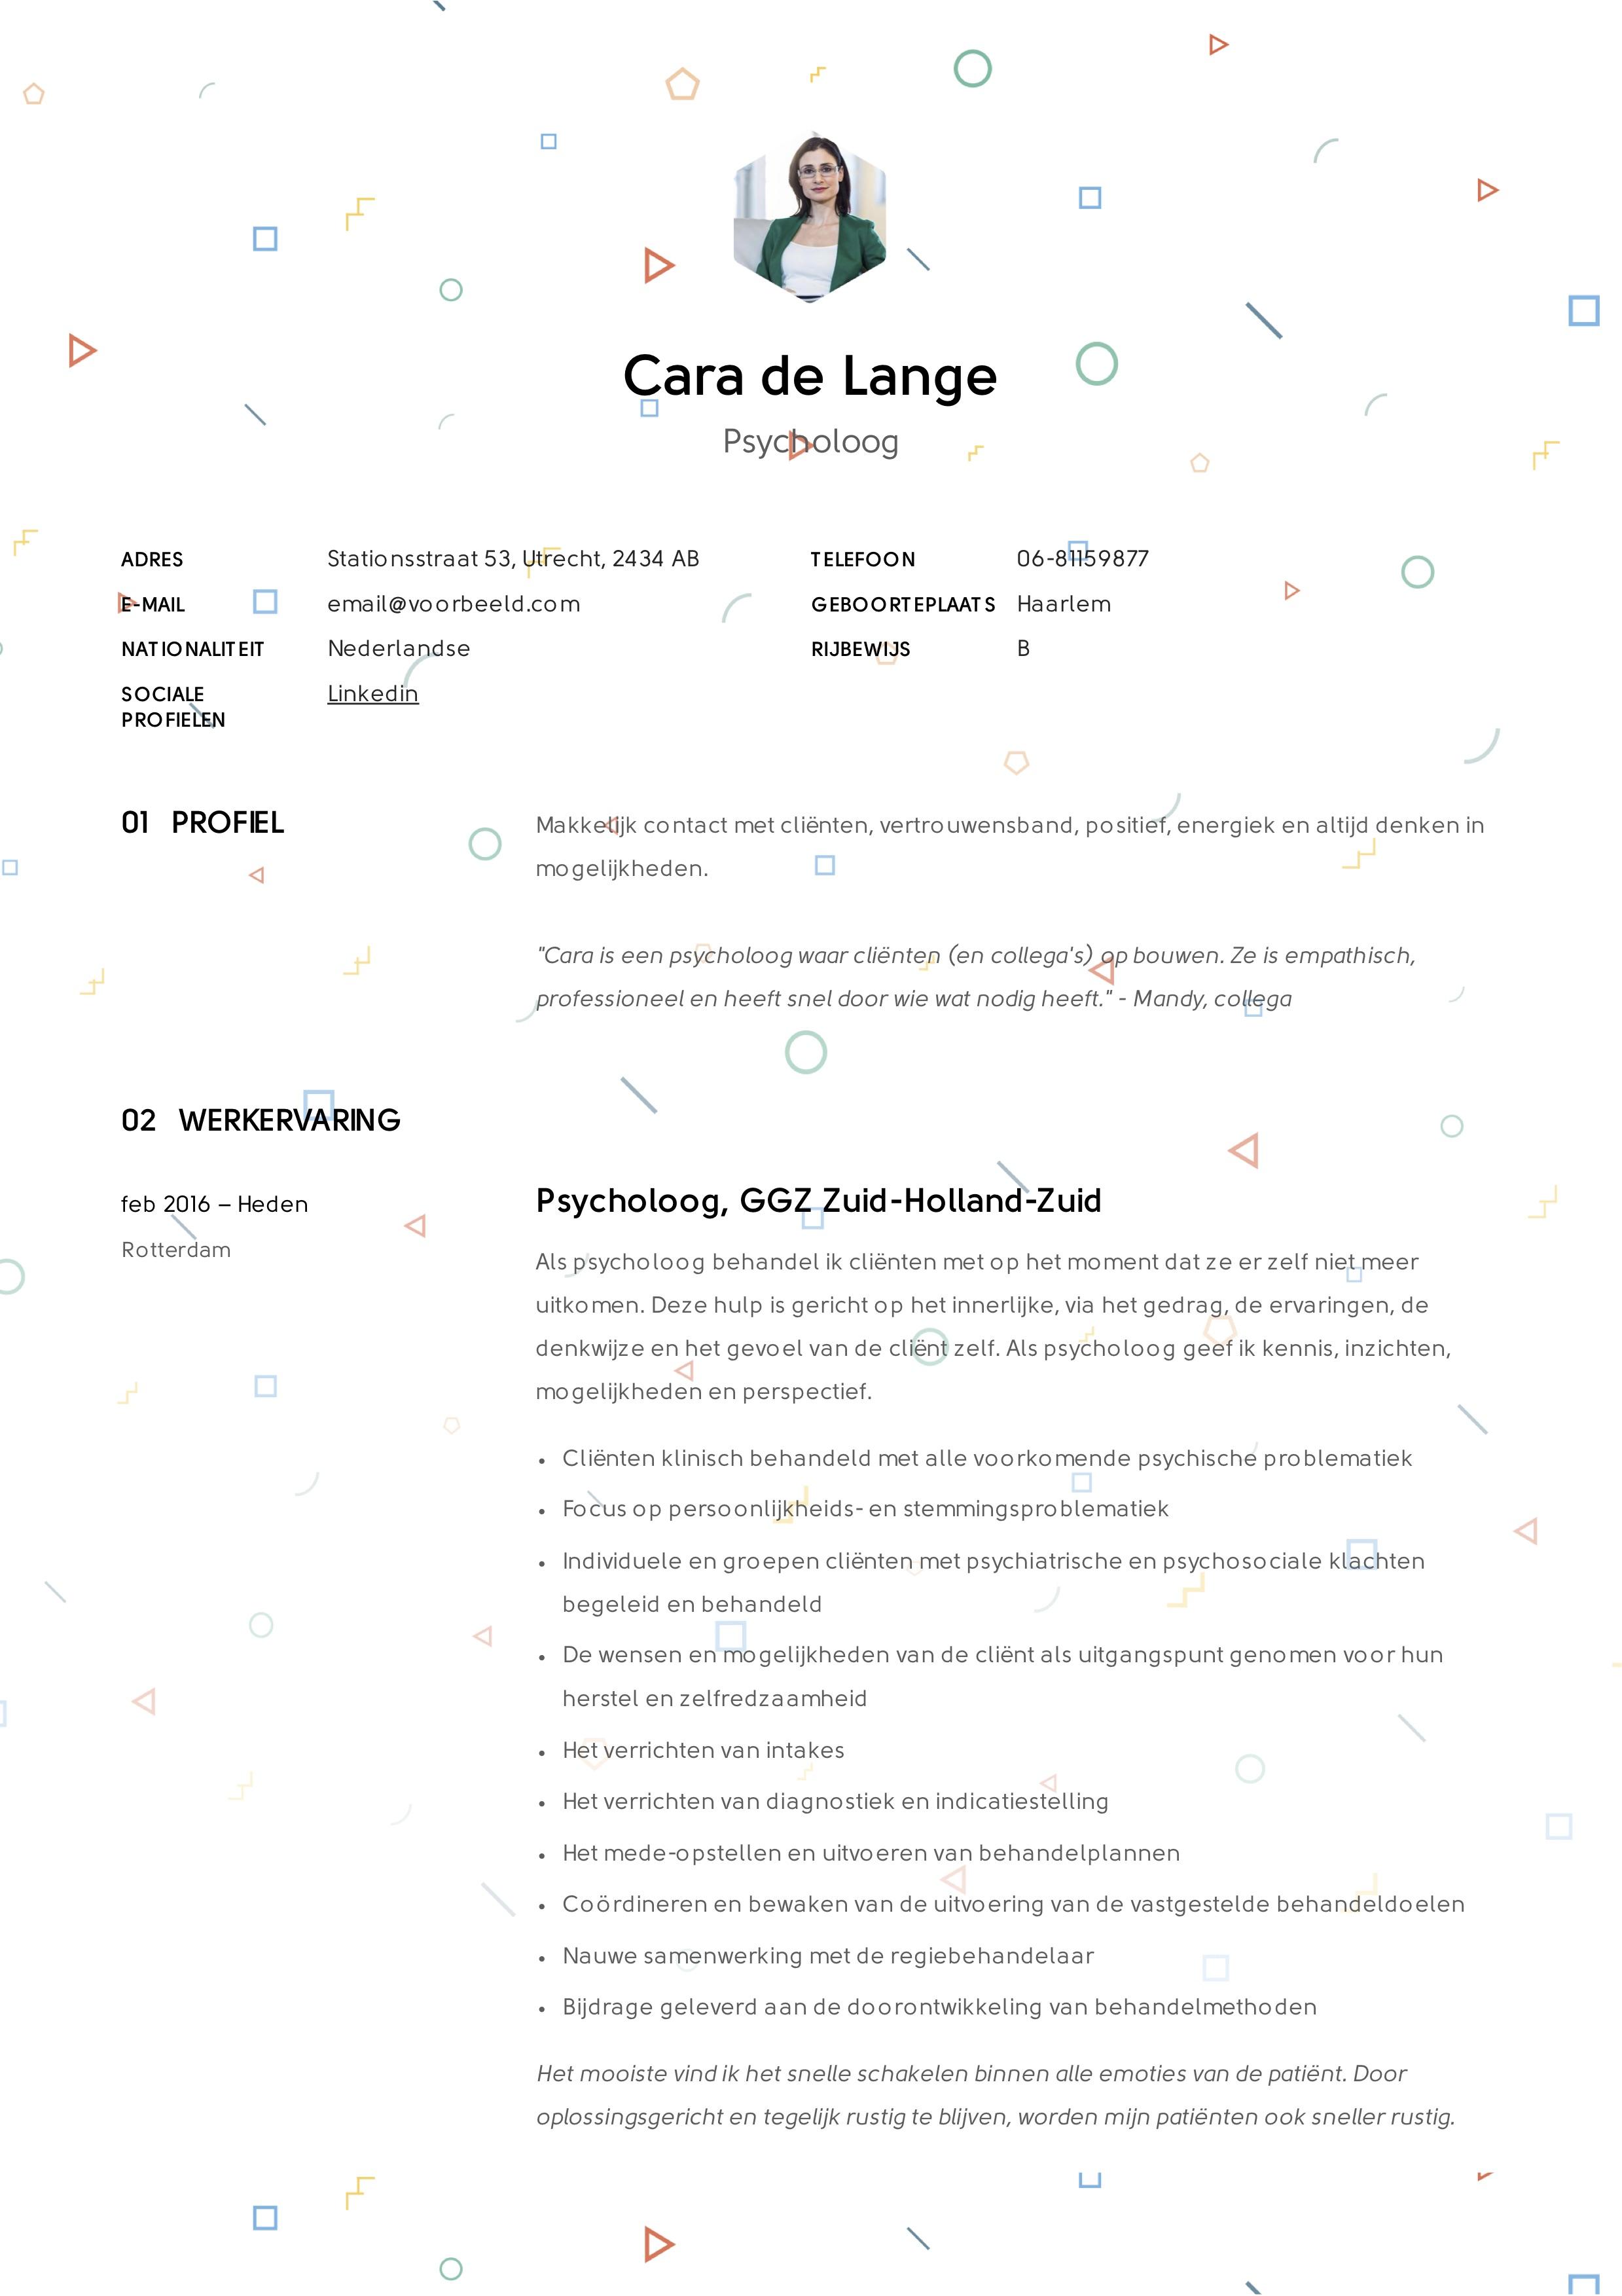 Cara_de_Lange_-_CV_-_Psycholoog (7)